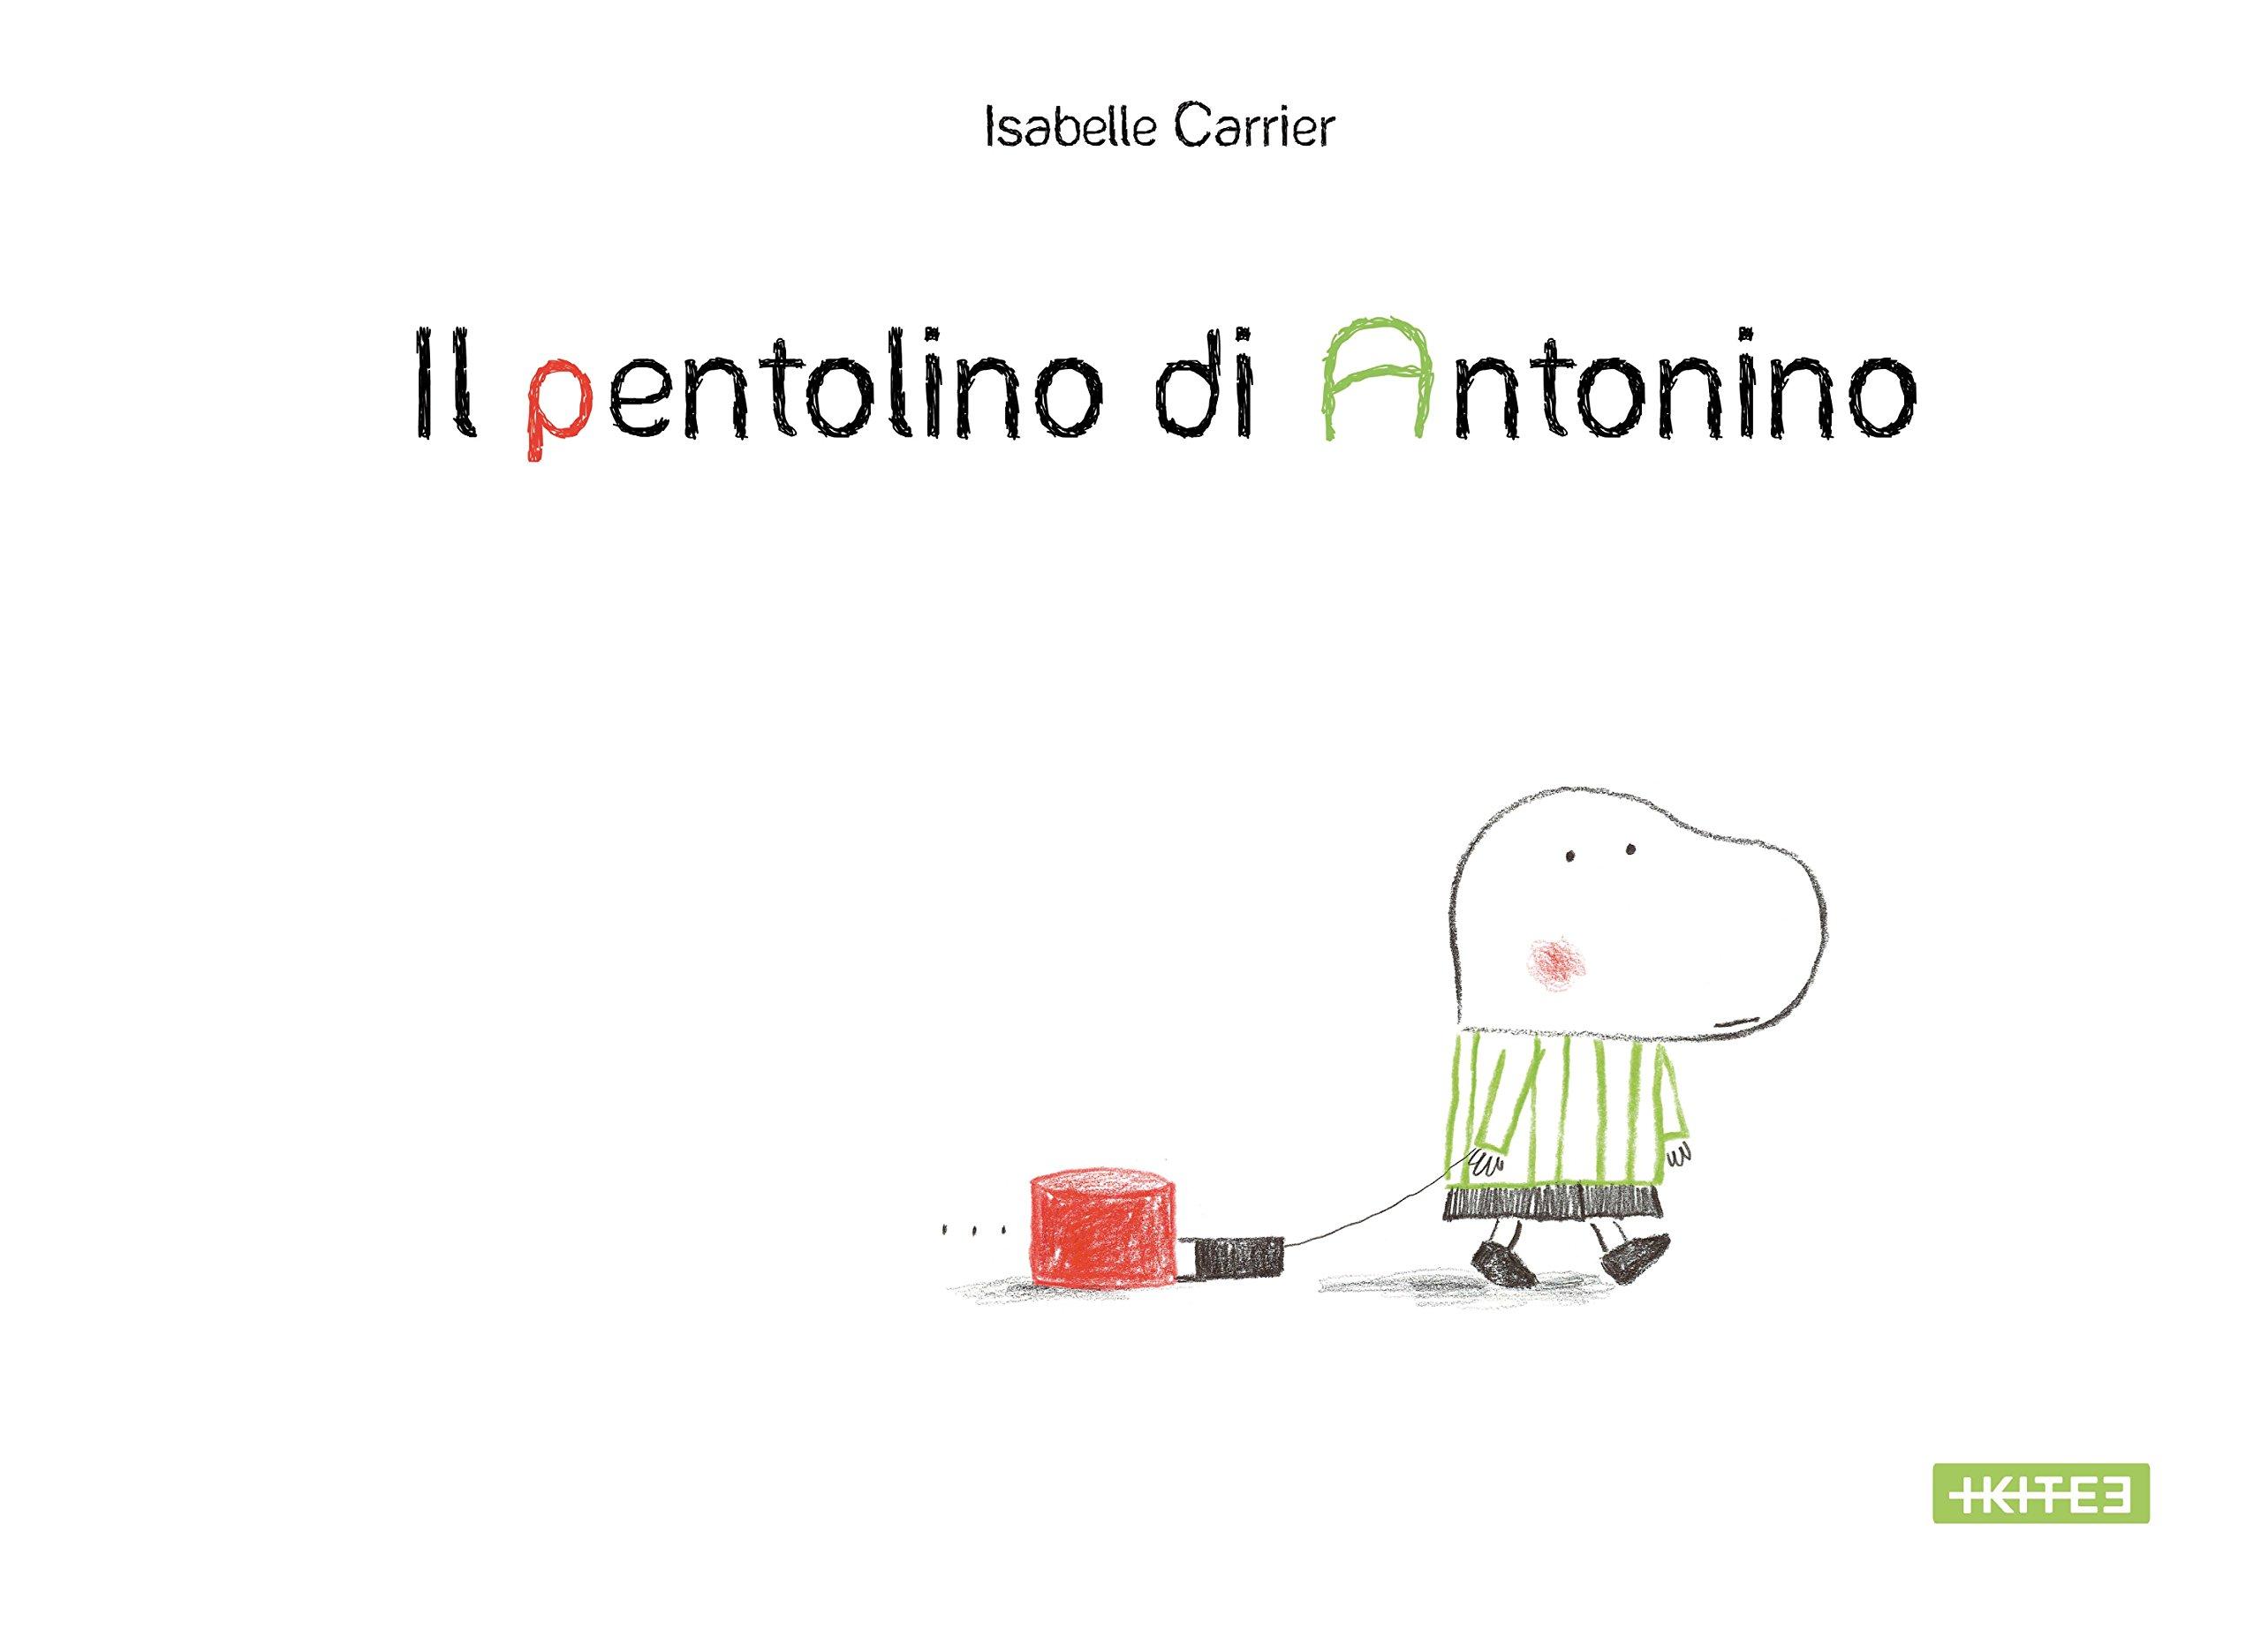 Il pentolino di Antonino – Isabelle Carrier